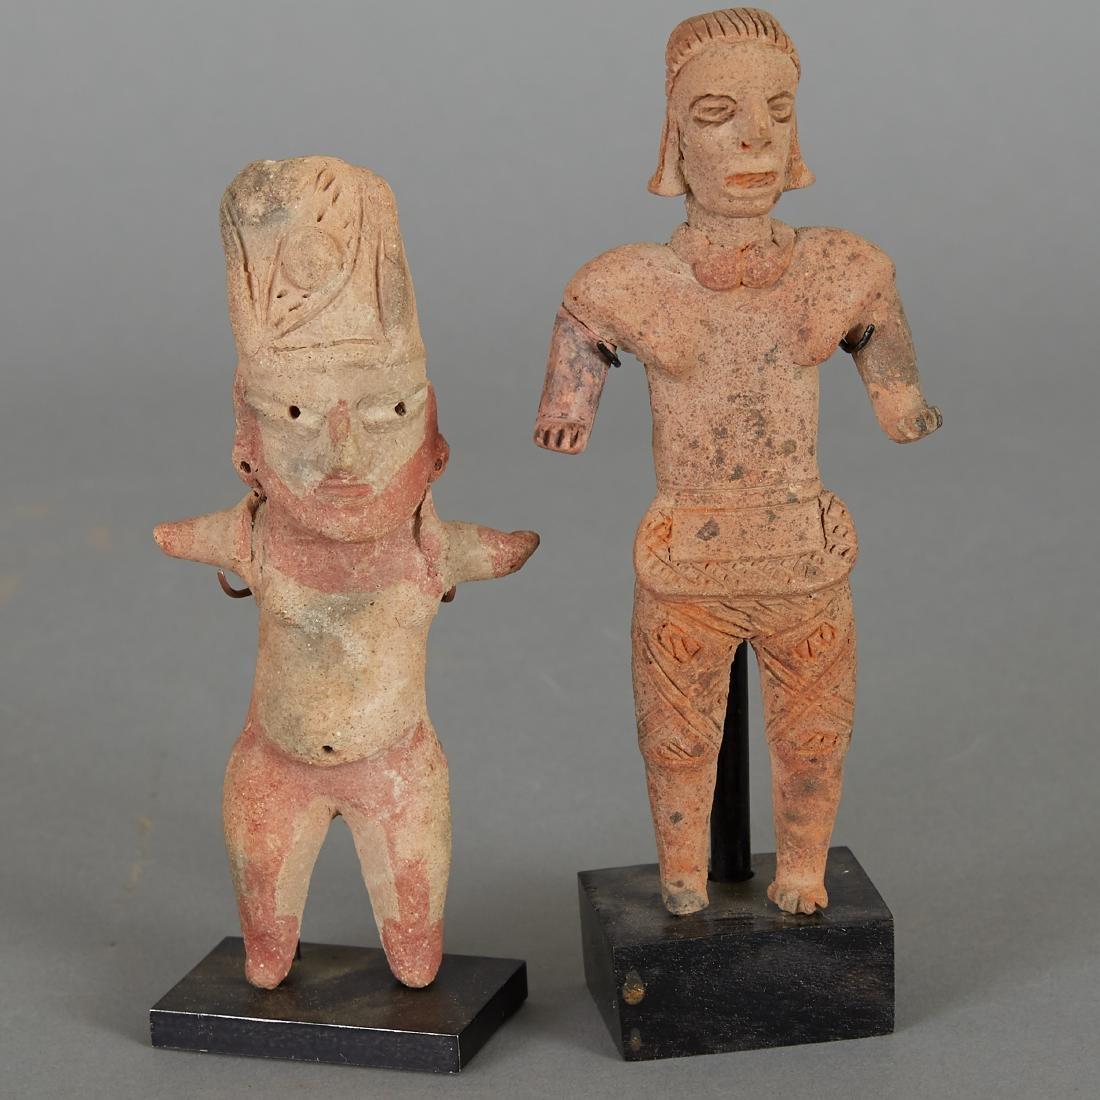 2 Pre-Columbian Female Figurines